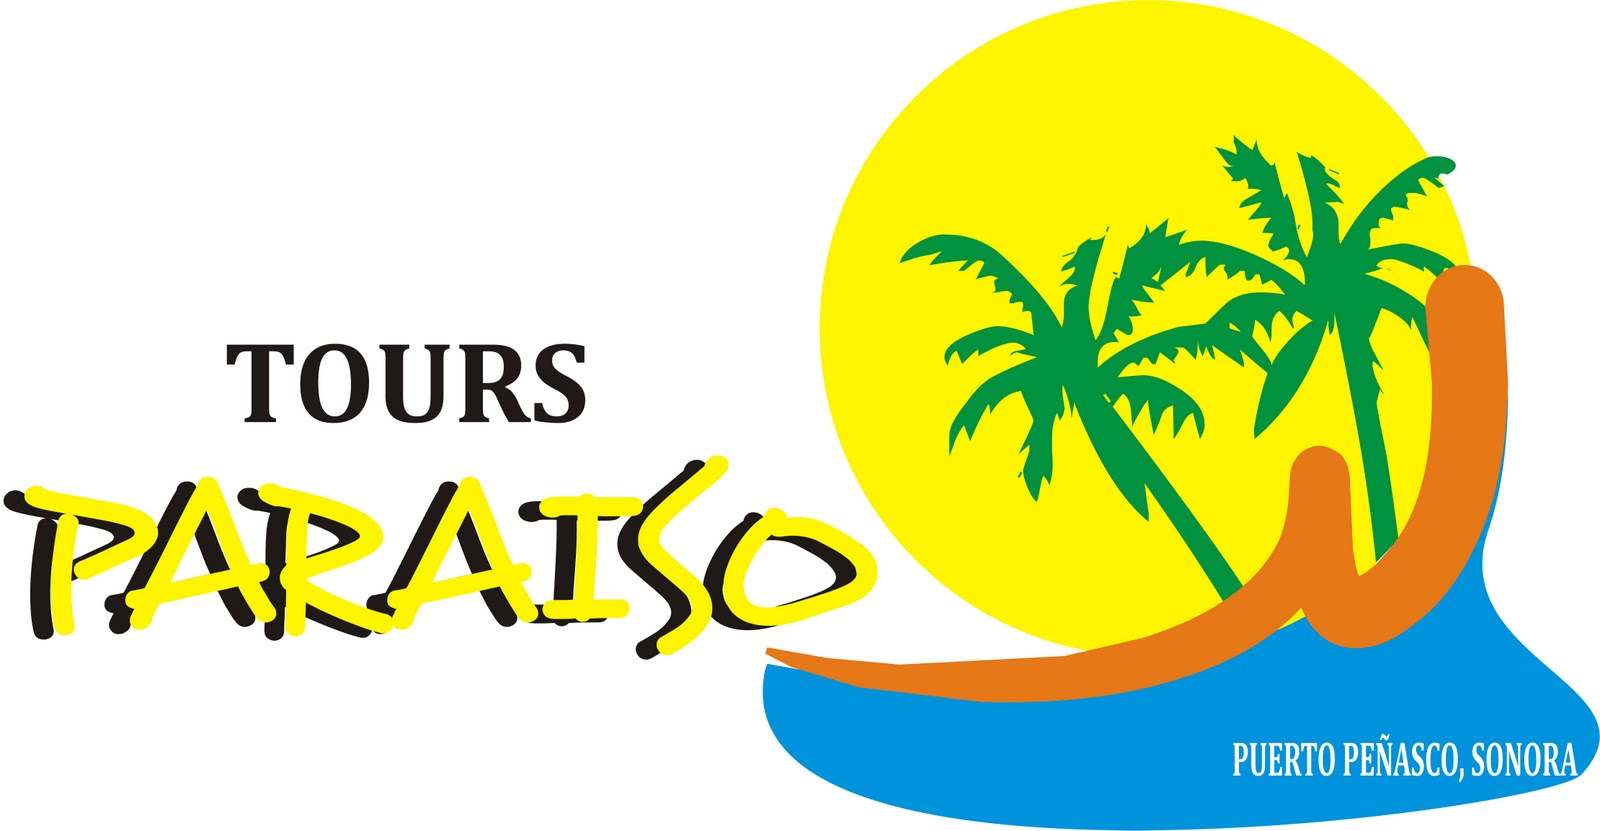 tours paraiso viajes a puerto pe241asco sonora